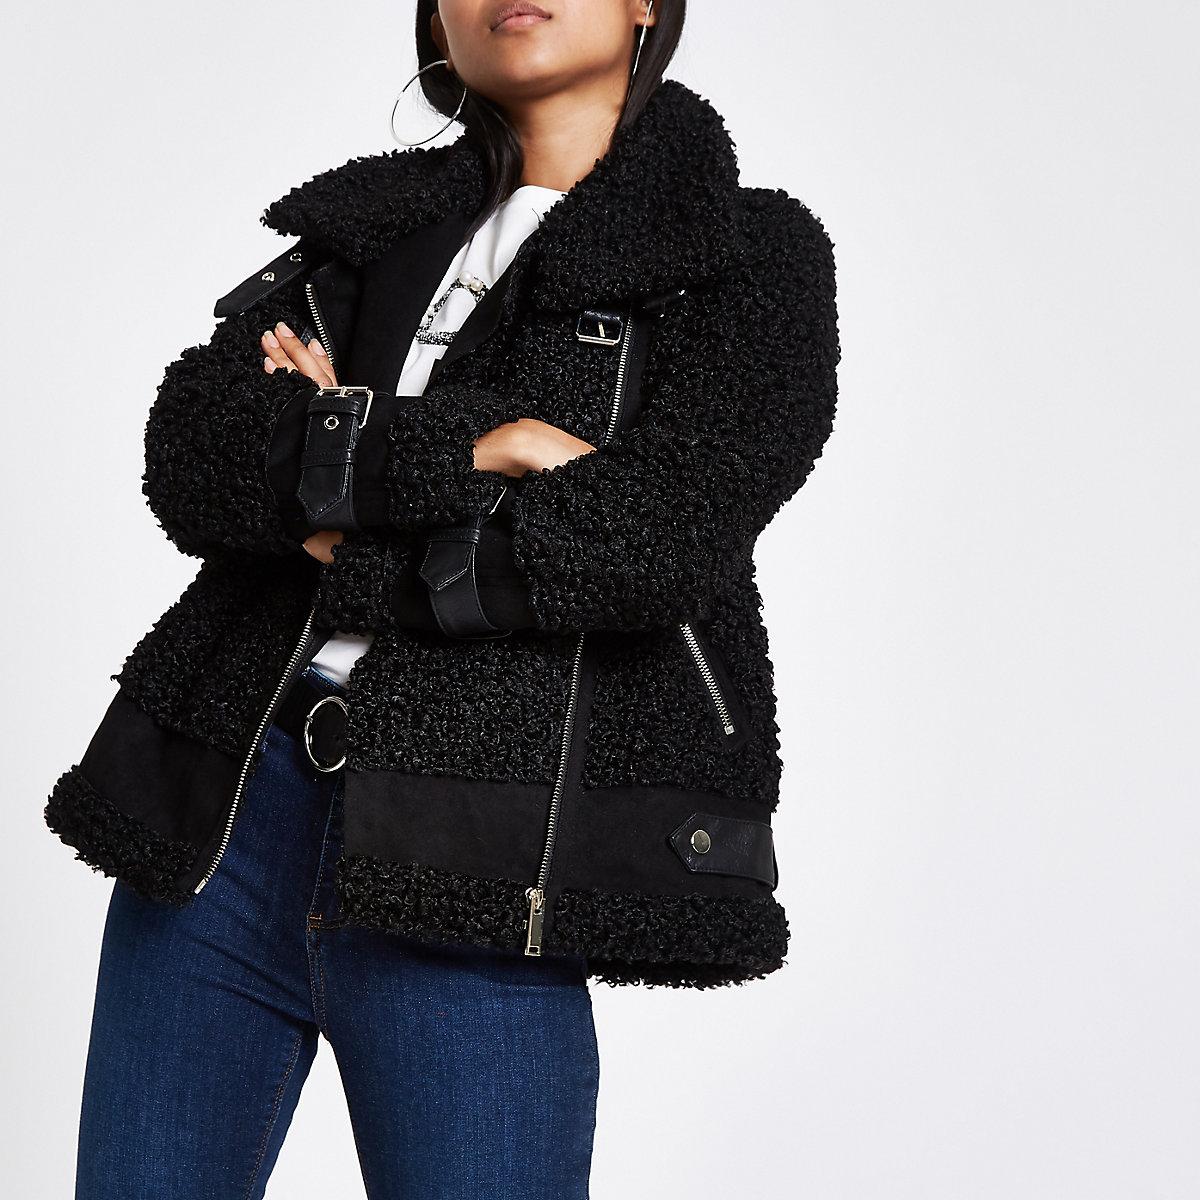 Petite black fleece aviator jacket